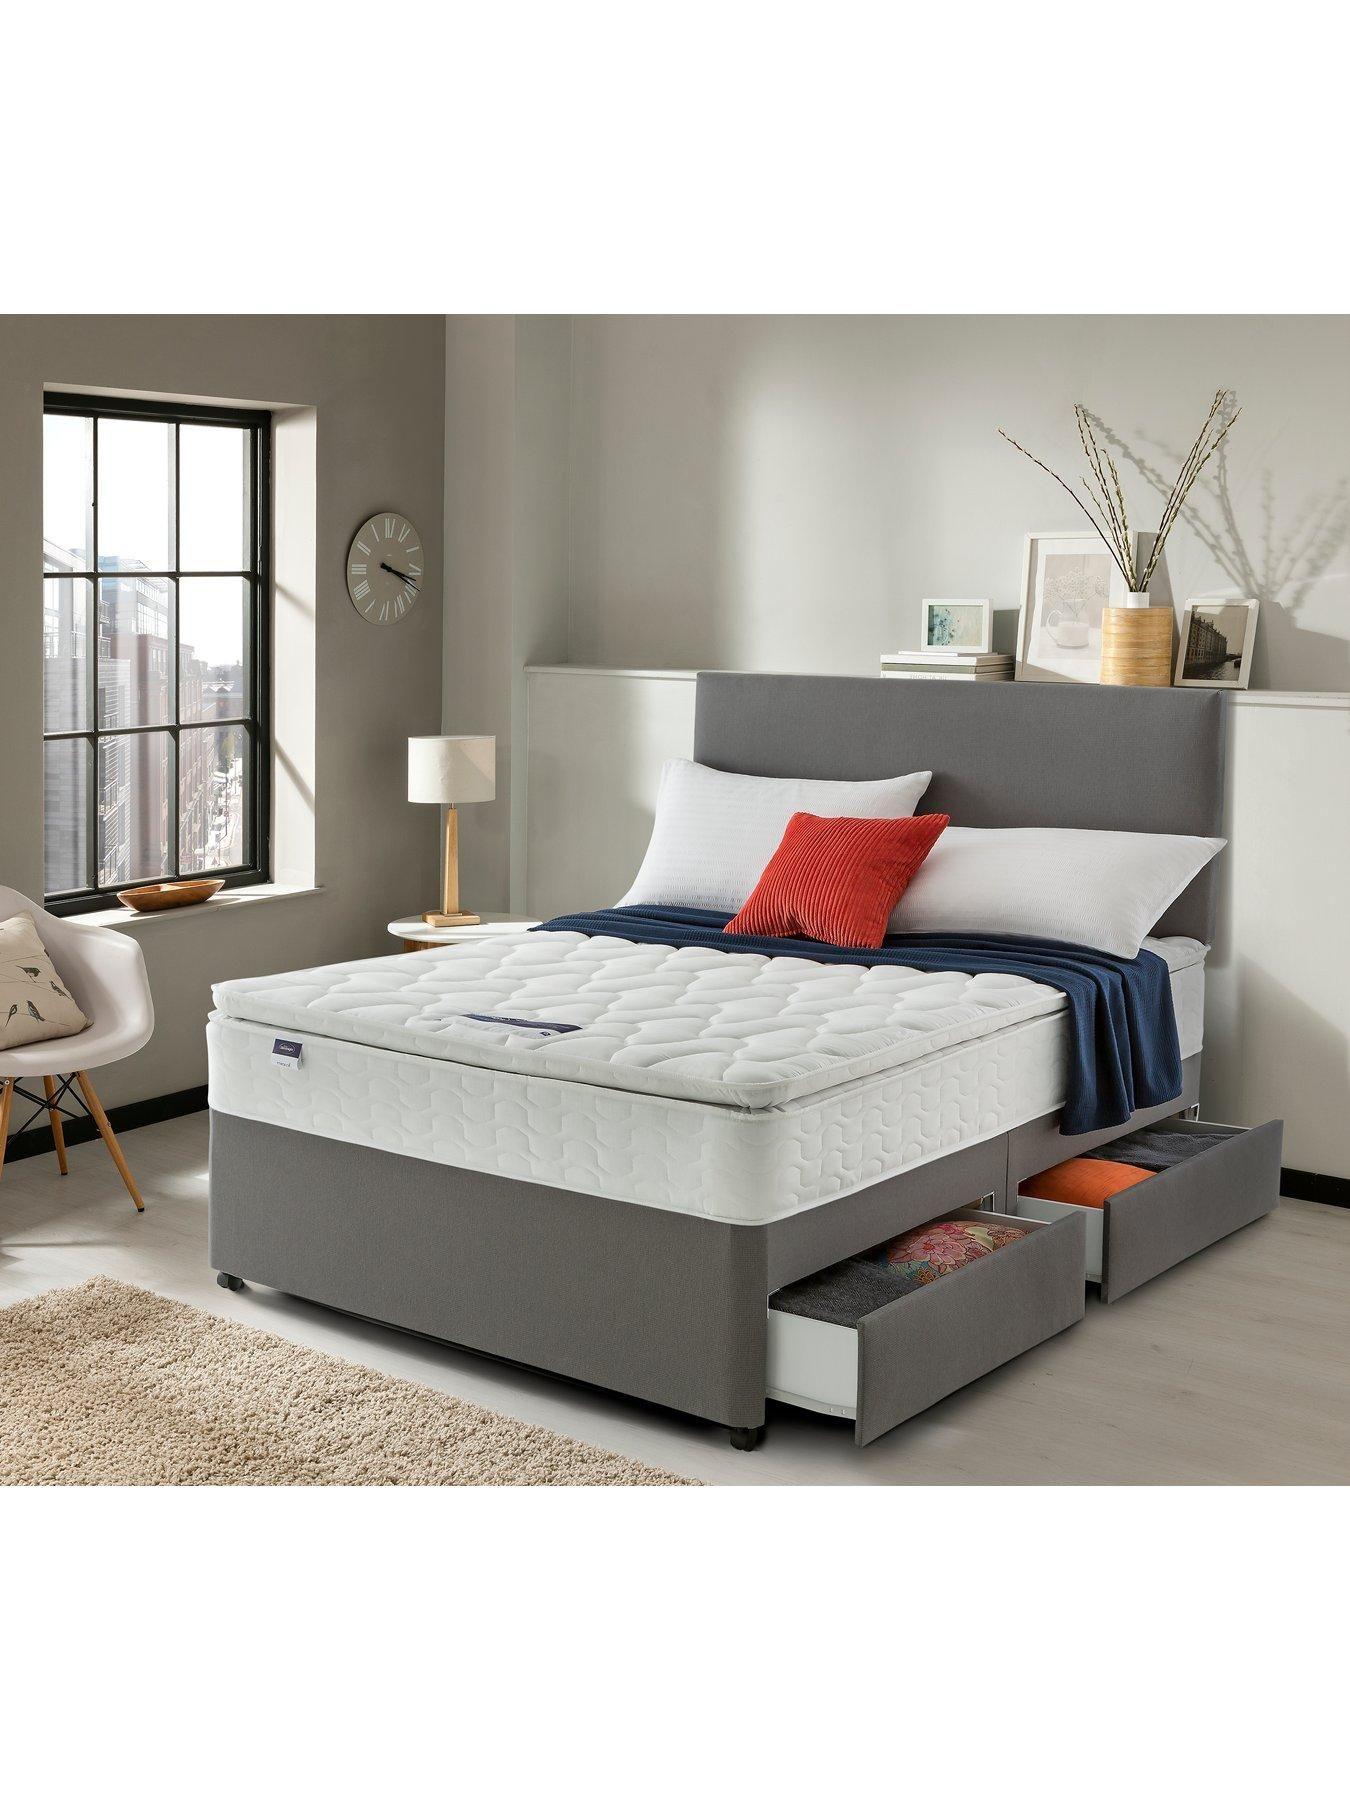 Silentnight Miracoil 3 Pippa Ultimate Pillowtop Divan Bed